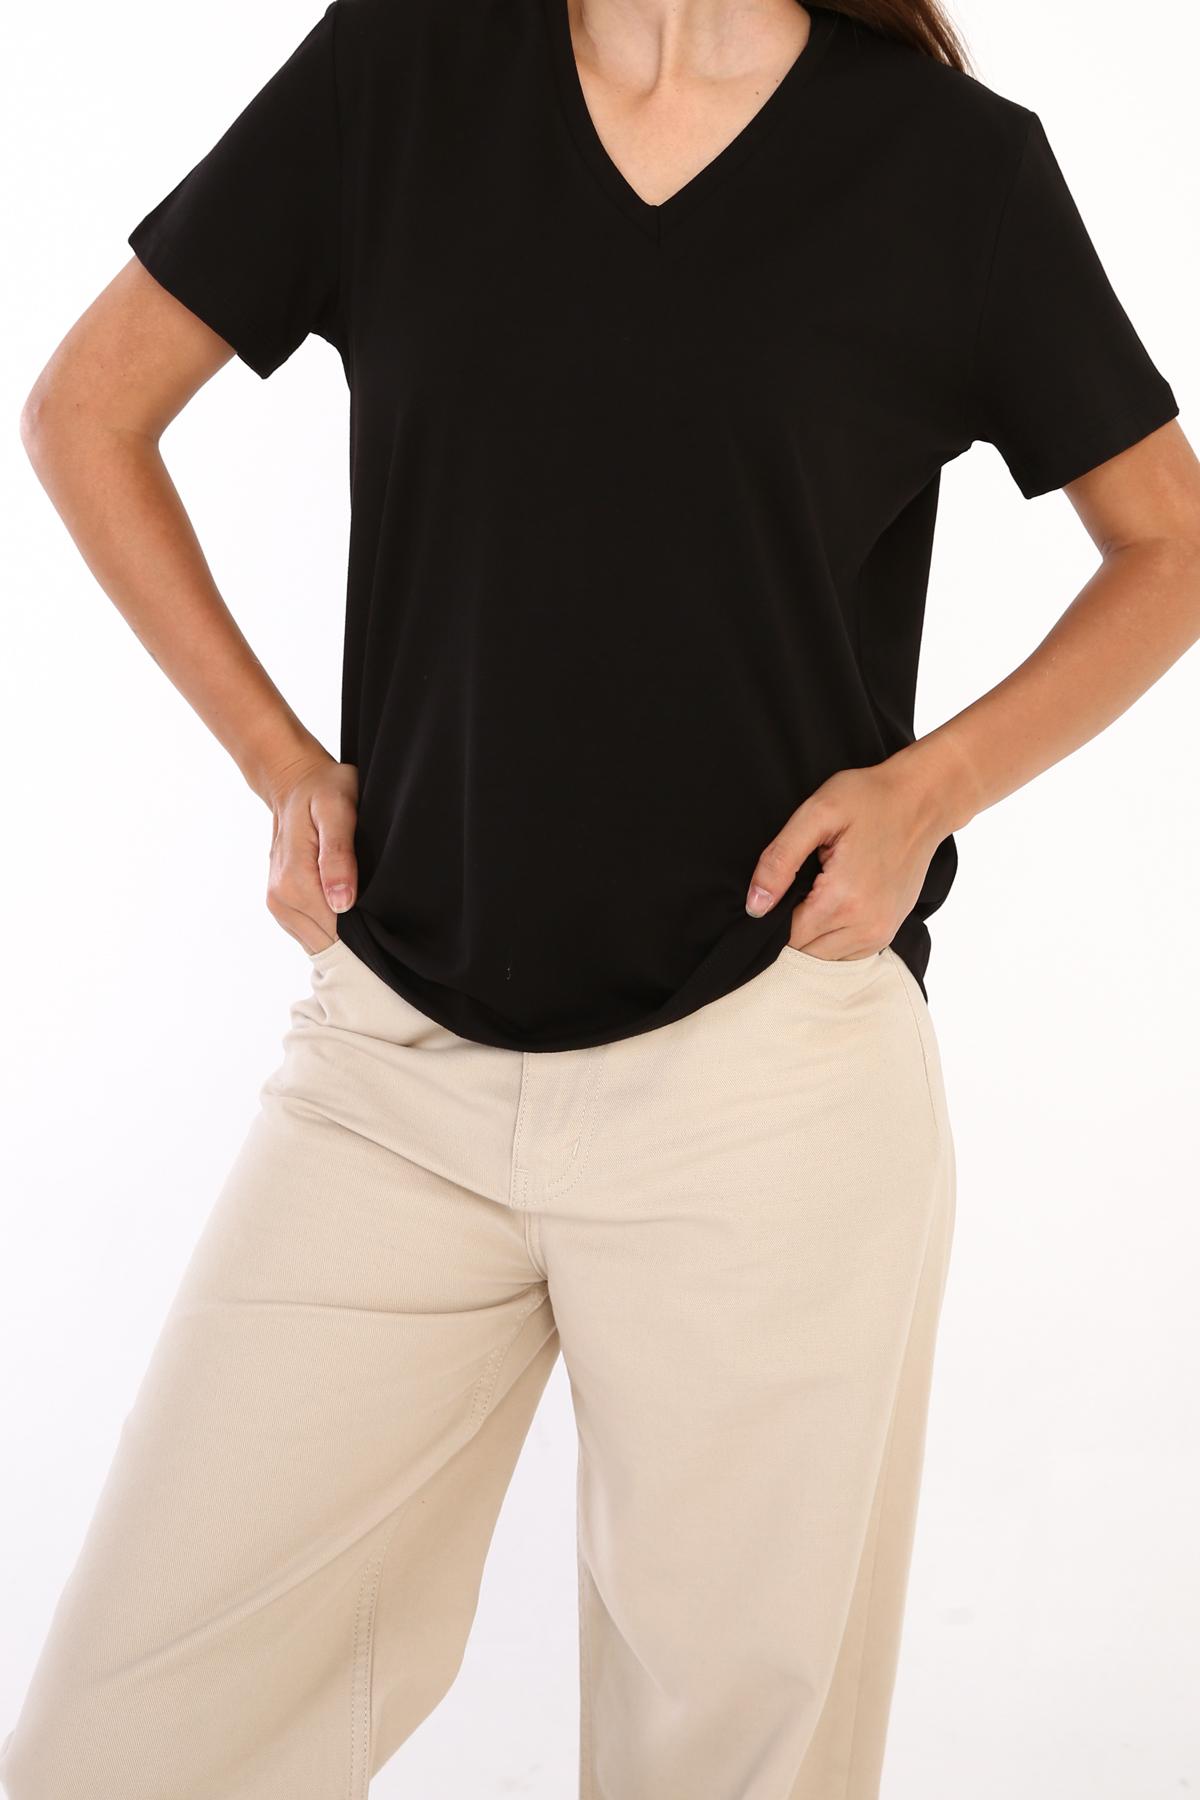 V Neck Cotton Basic T-shirt